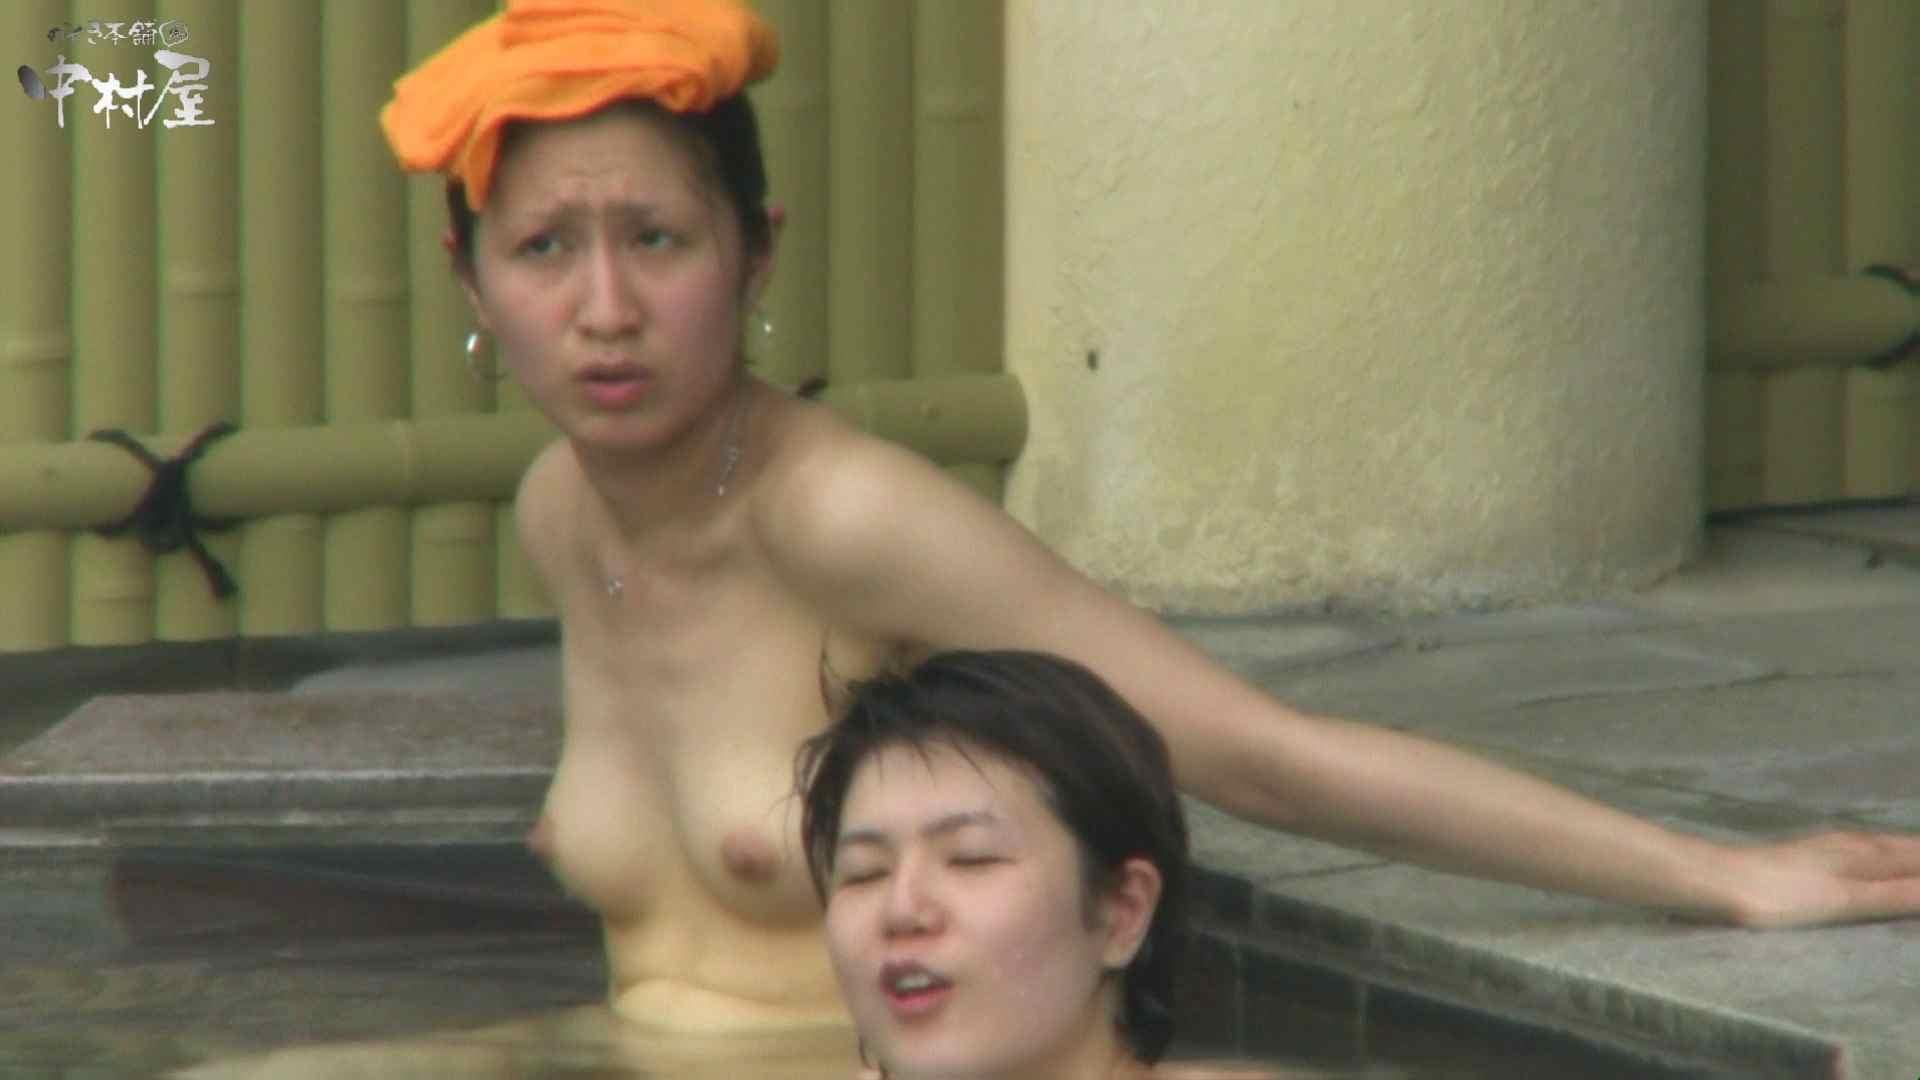 Aquaな露天風呂Vol.945 OLすけべ画像 | 盗撮  36連発 16